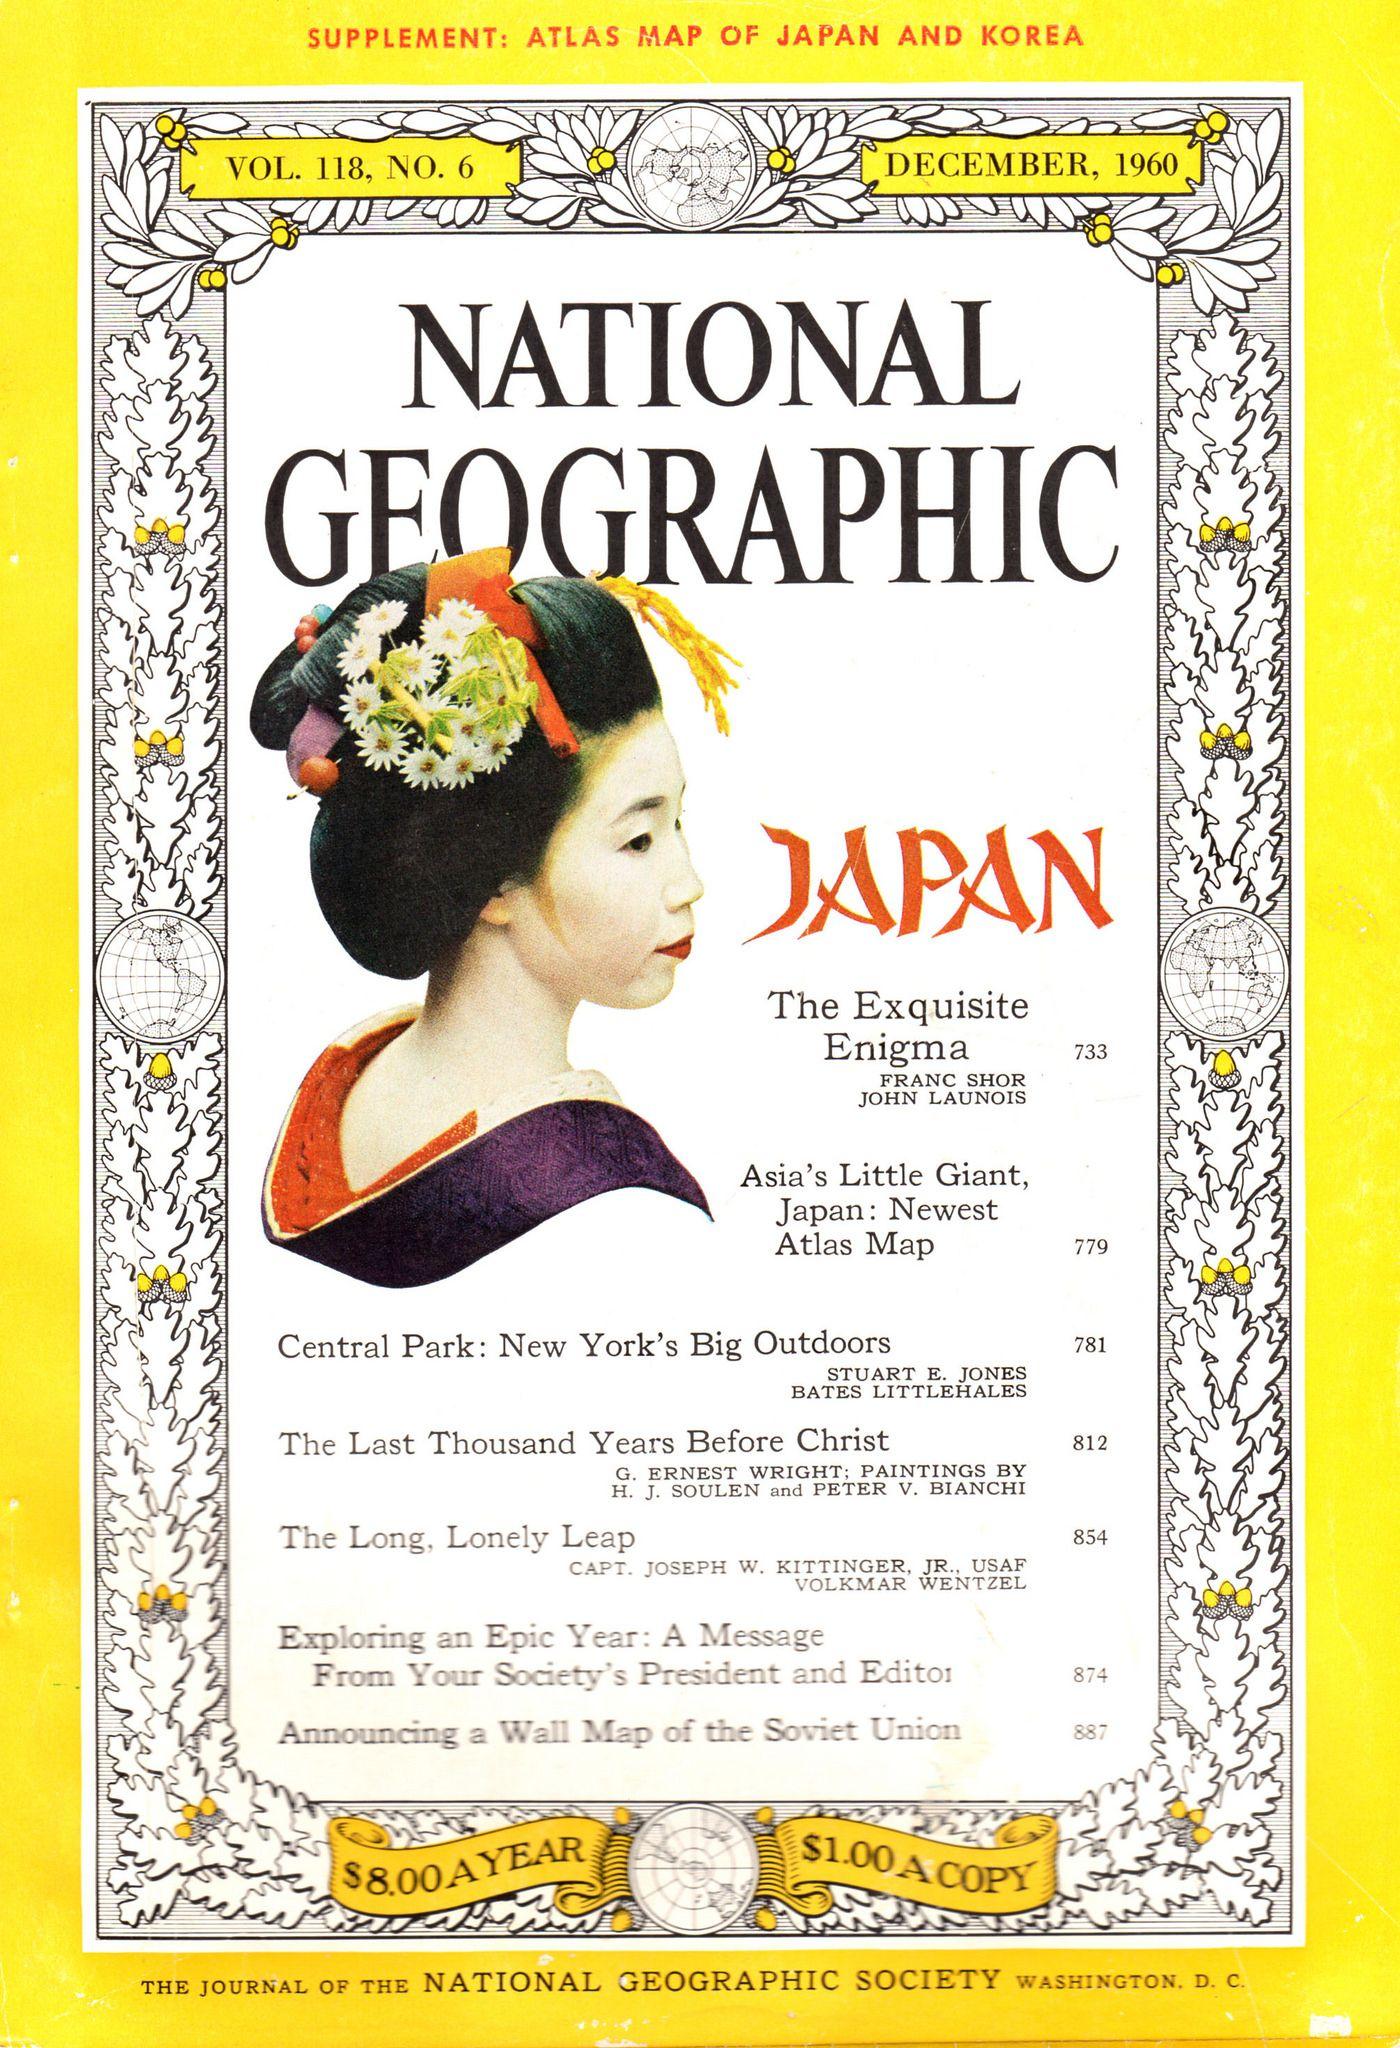 https://flic.kr/p/q7vTfP | National Geographic Dec 1960 front cover | December 1960 National Geographic